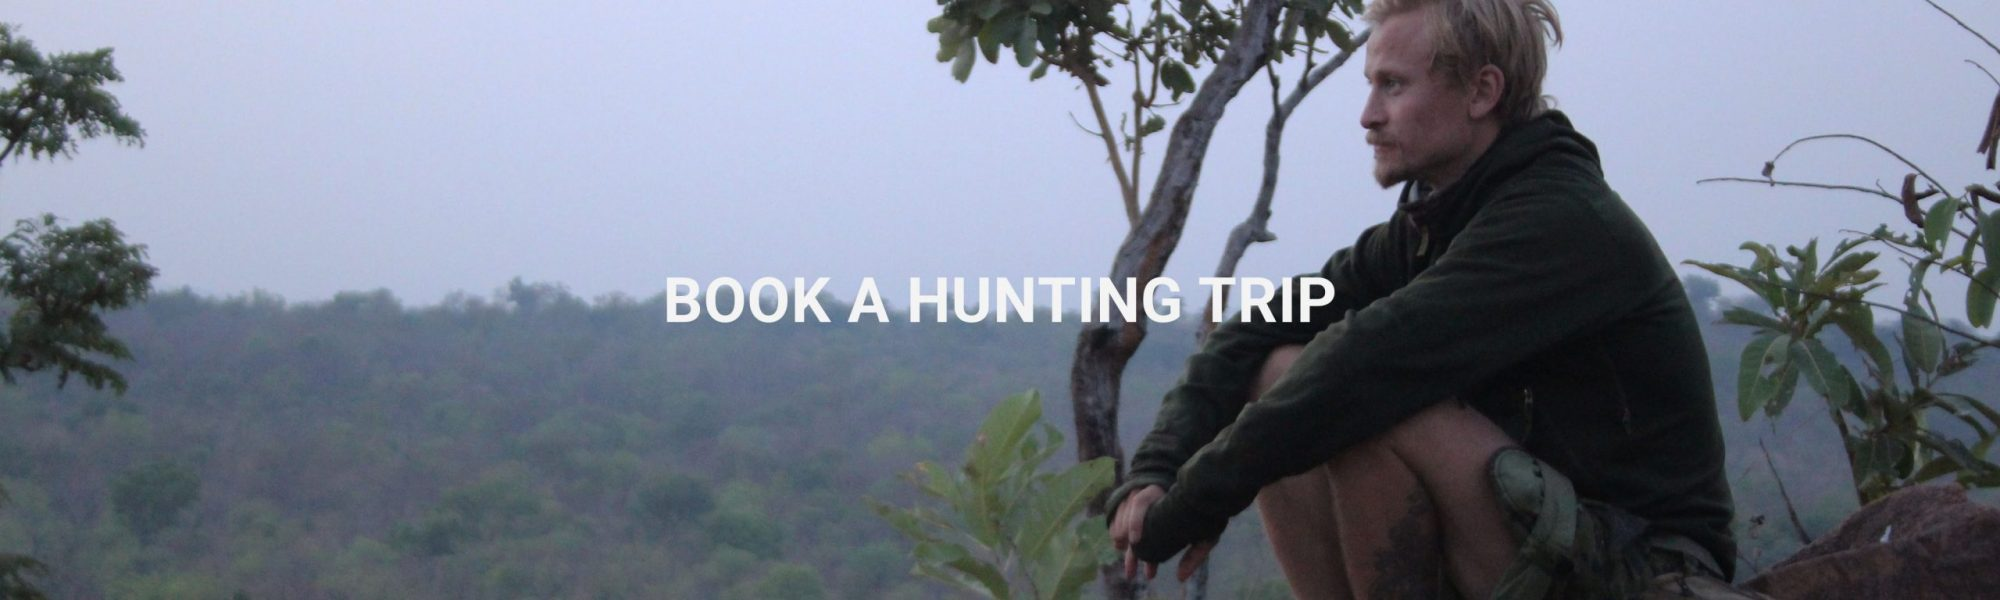 Book a hunting trip